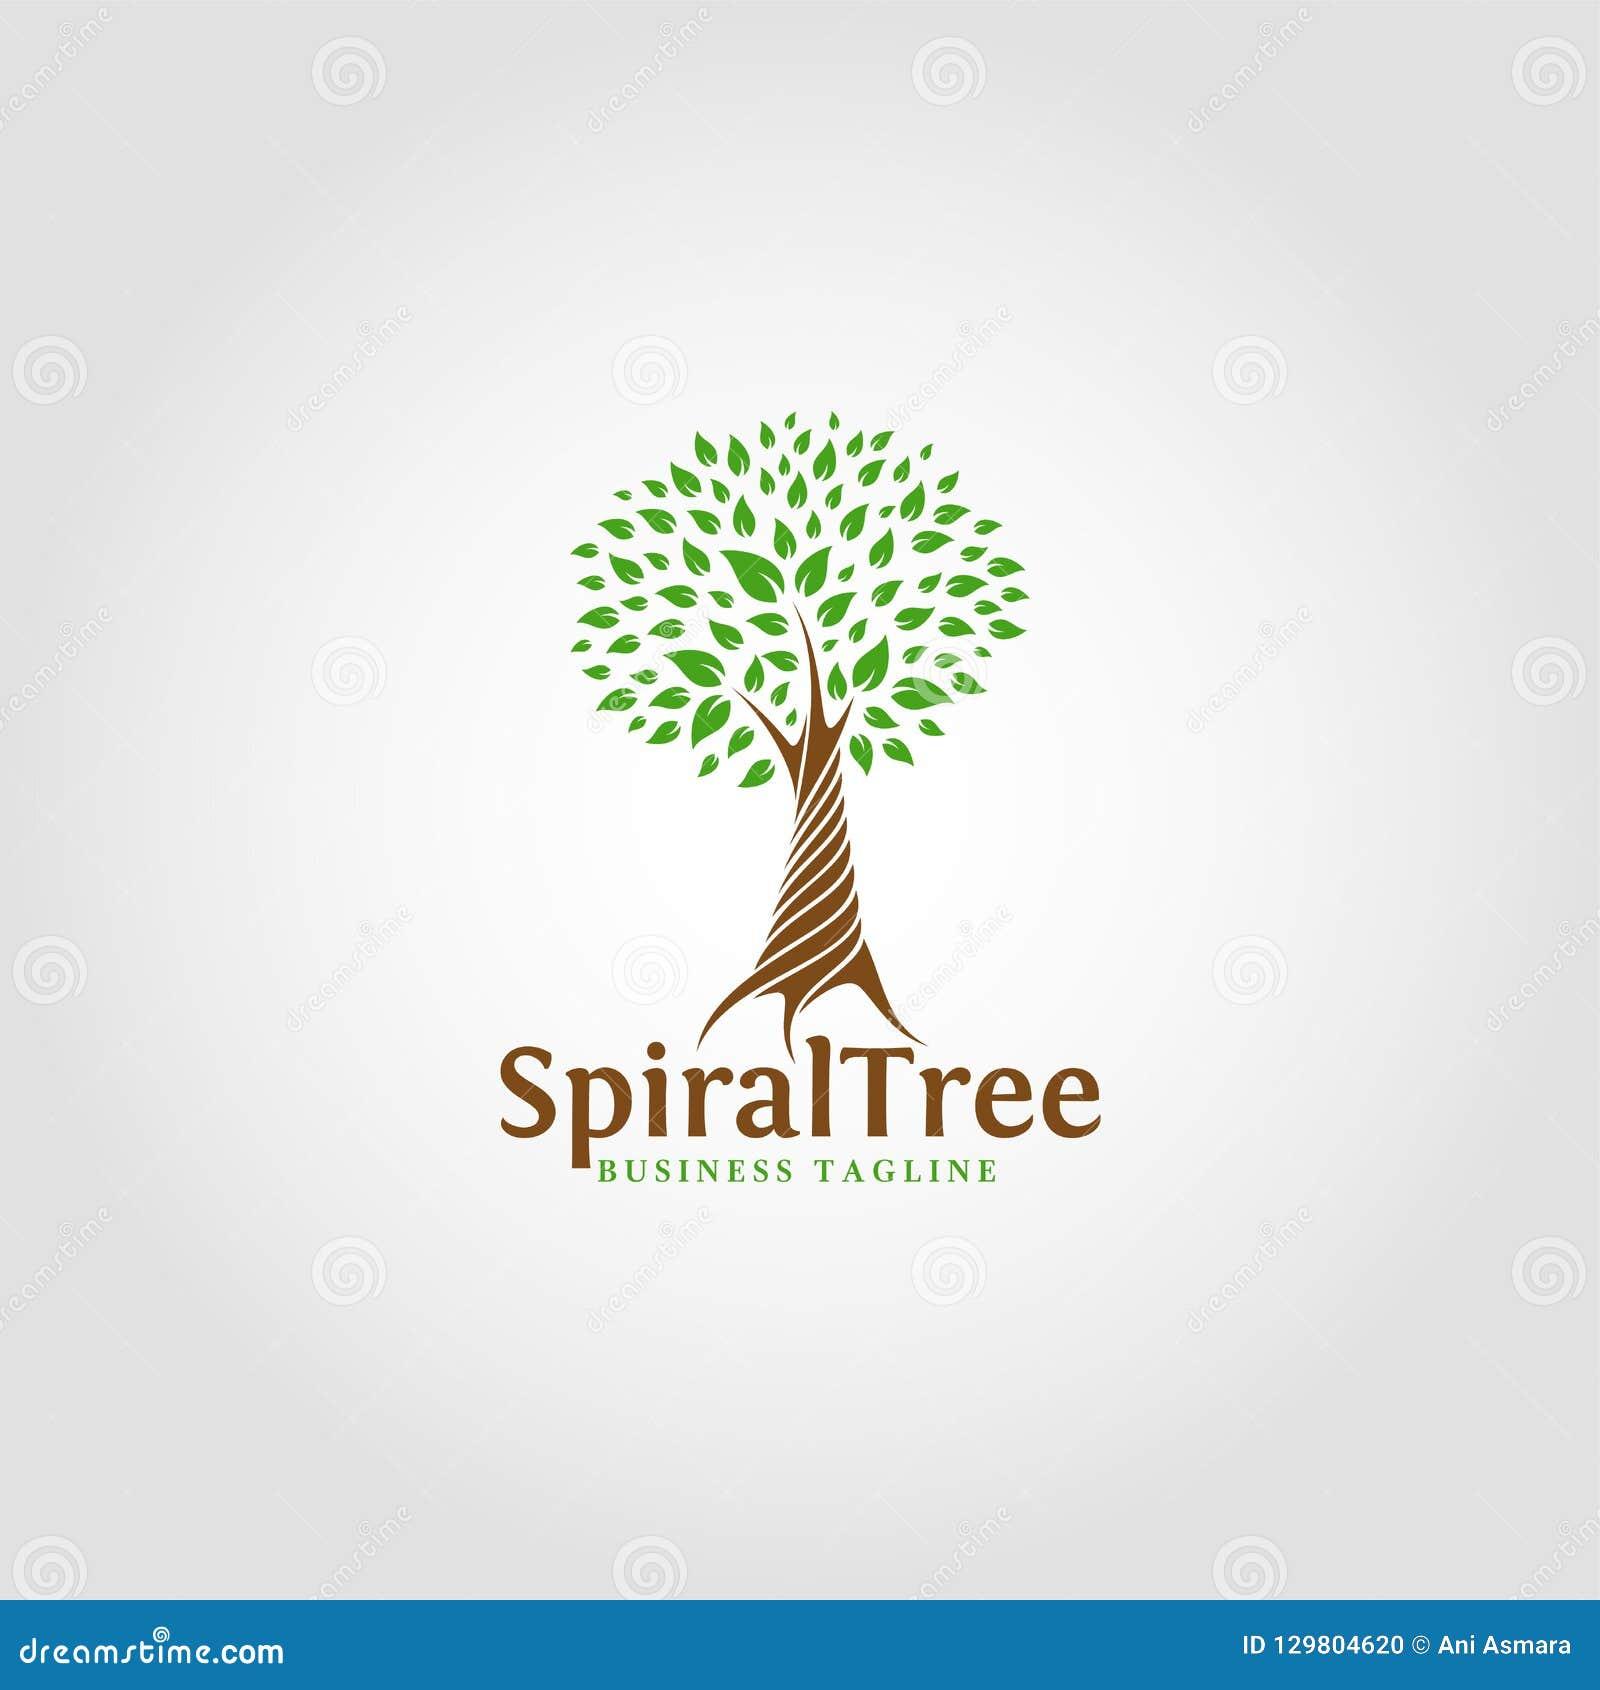 螺旋树-自然商标模板